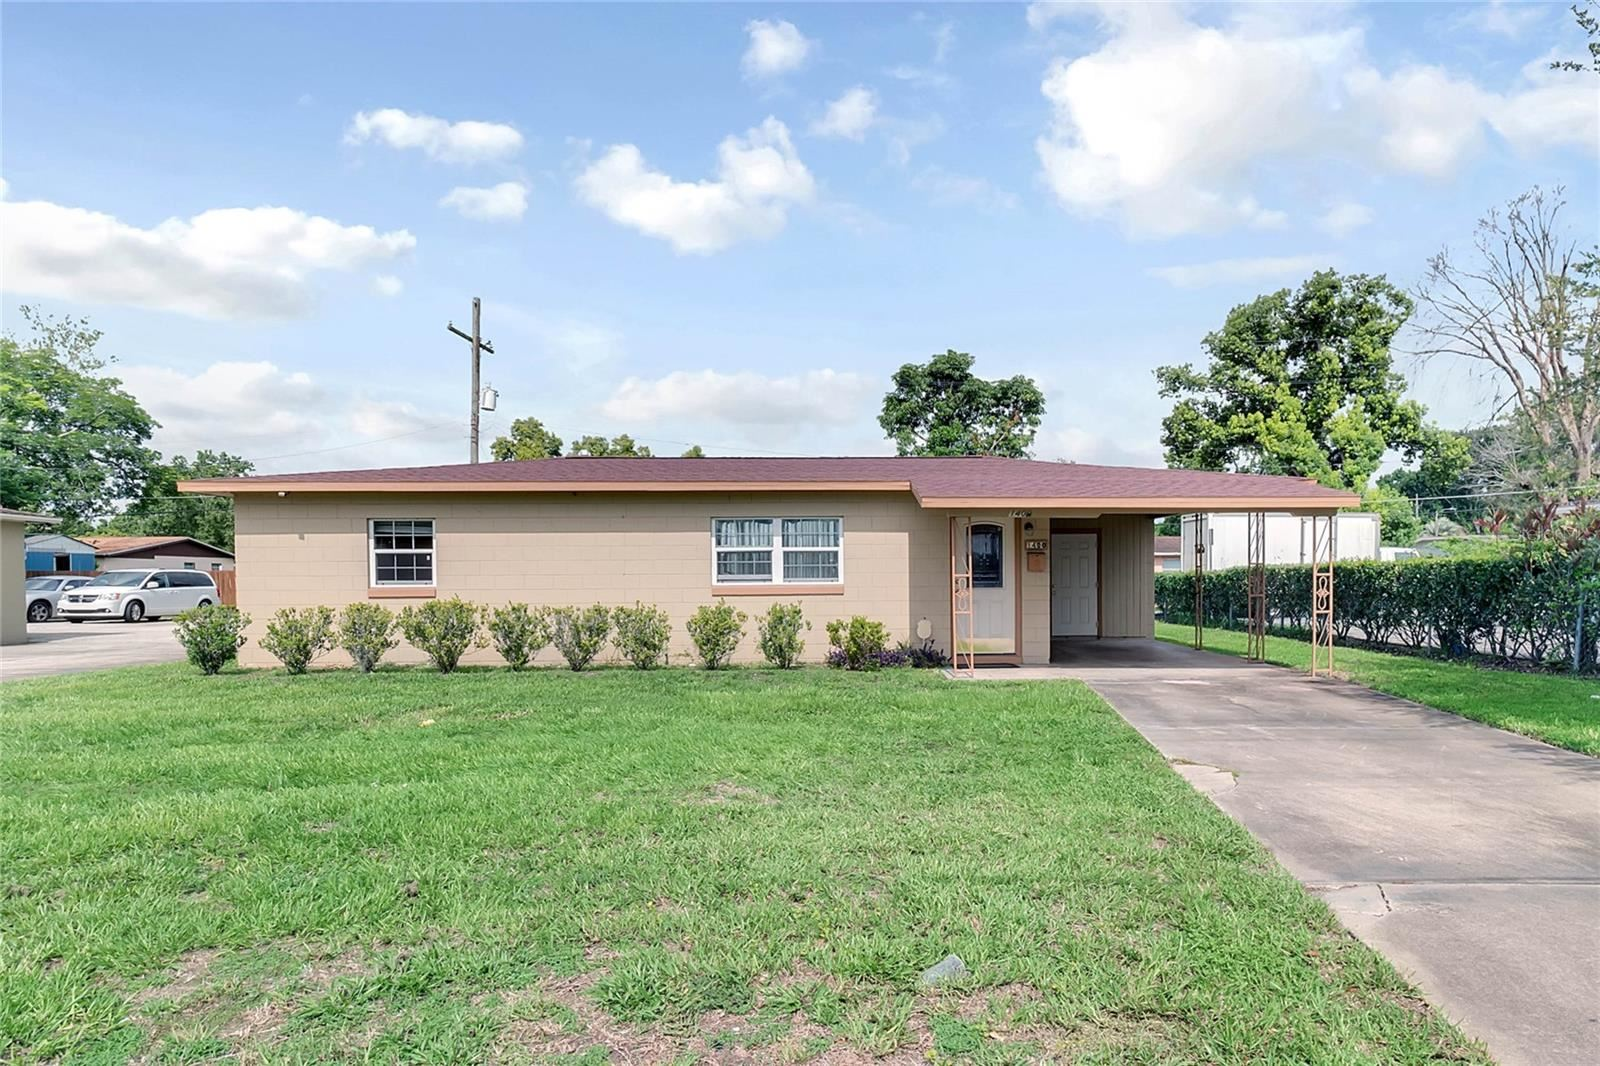 1400 S SEMORAN BOULEVARD, Orlando, FL 32807 - MLS#: O5960442